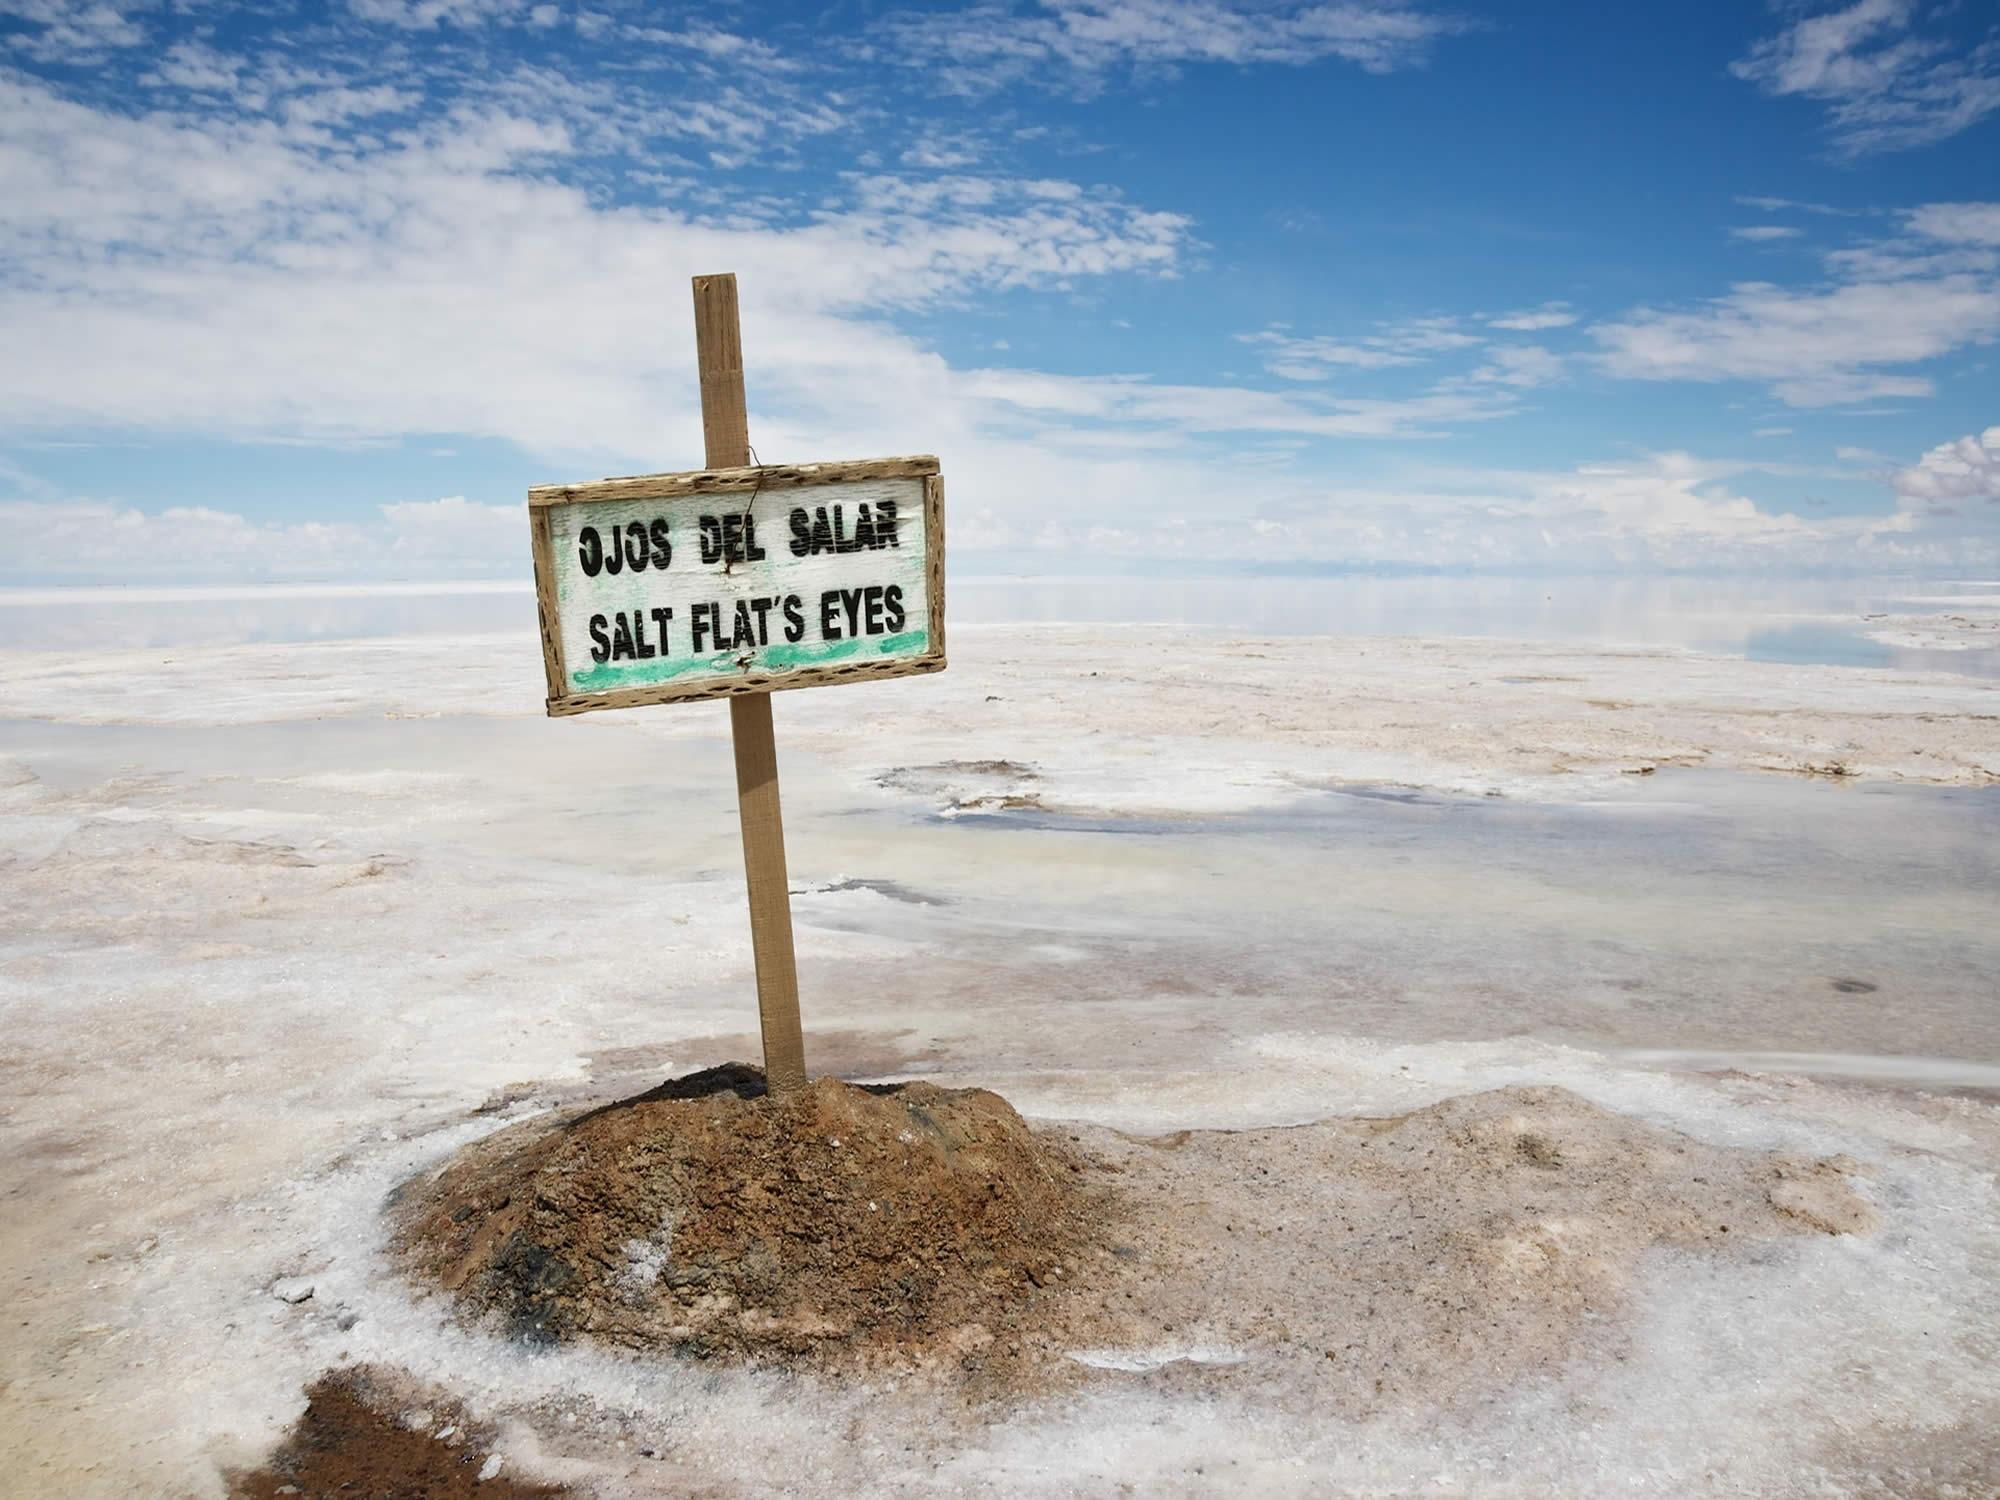 Ojos del Salar - Eyes of the Salt Flat